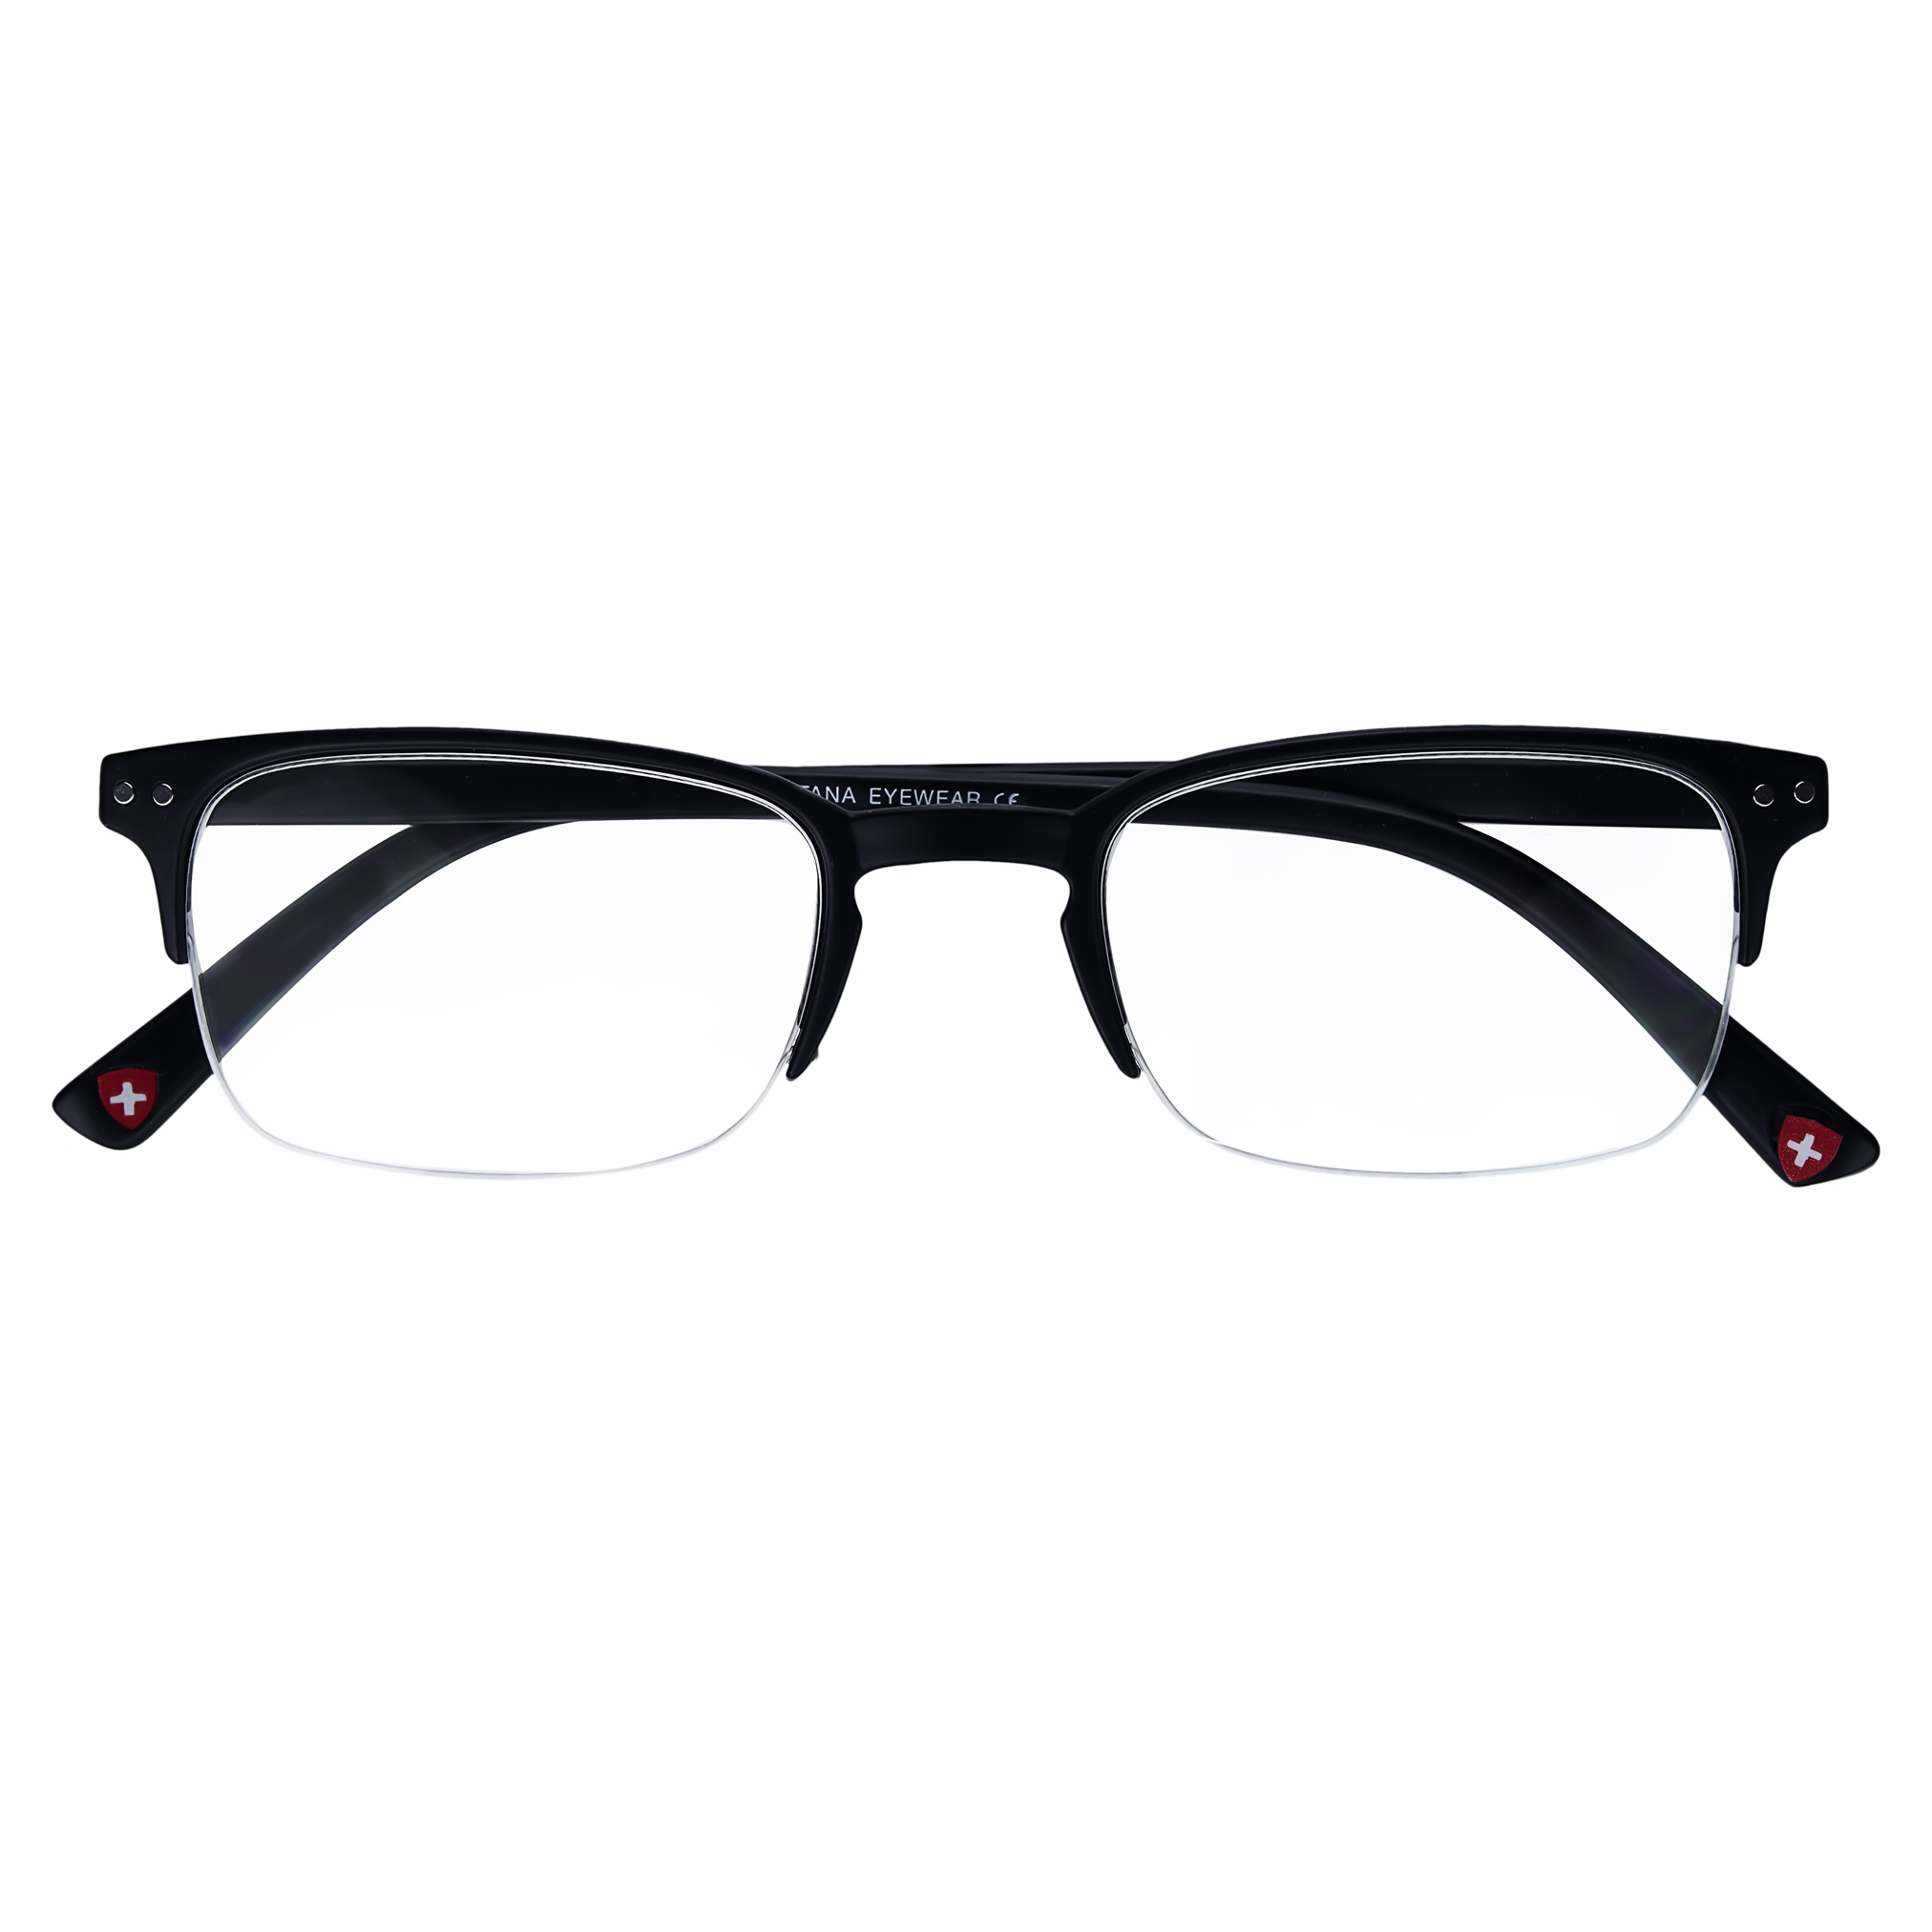 f6995dafbb3c SEMI RIMLESS READING GLASSES UK | Half Rim Readers |JustGlasses